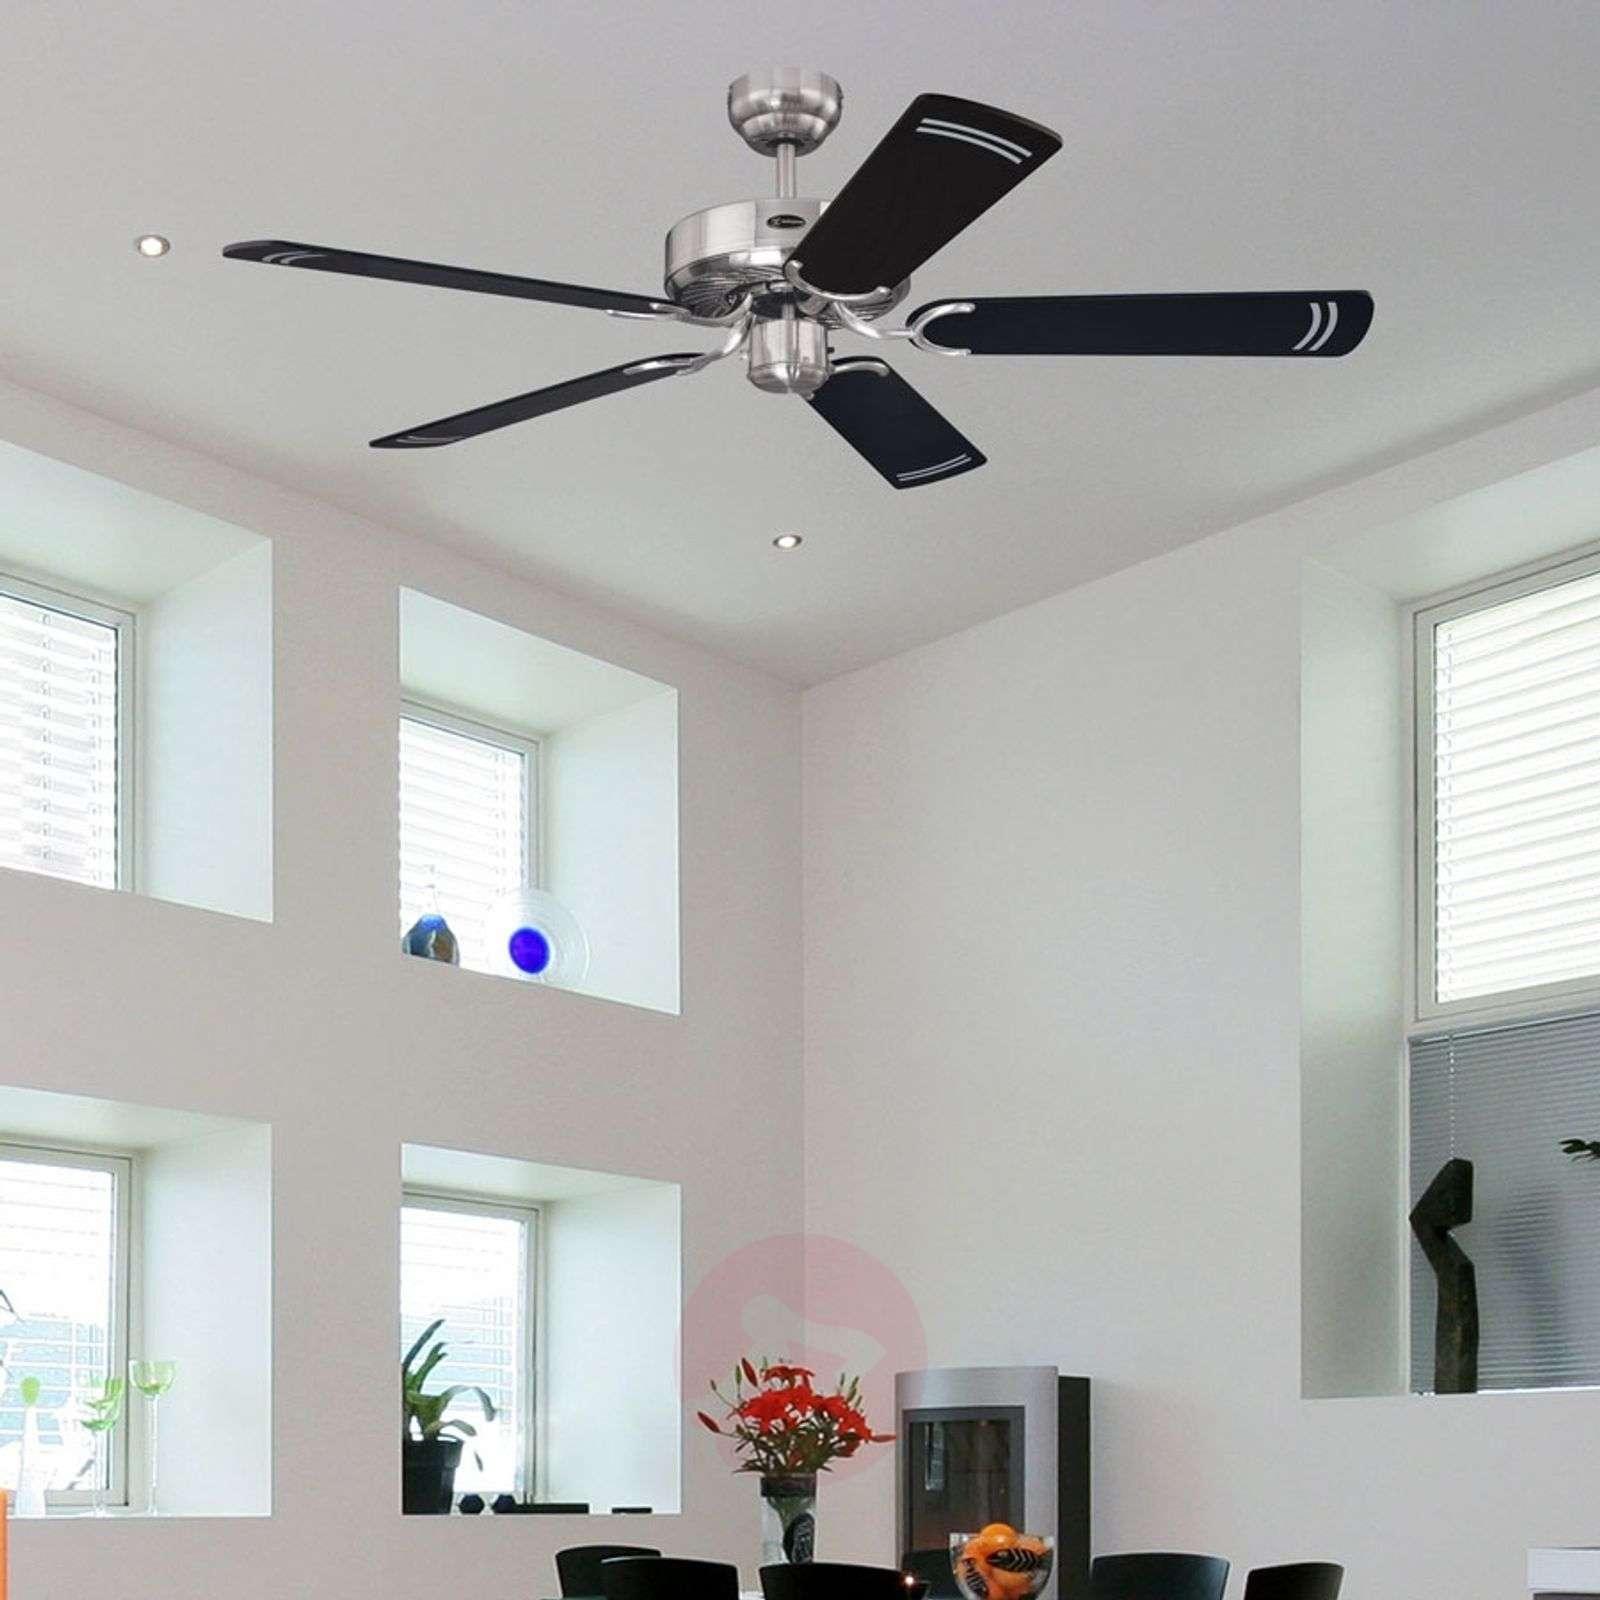 Cyclone ceiling fan in elegant black-9602044-08